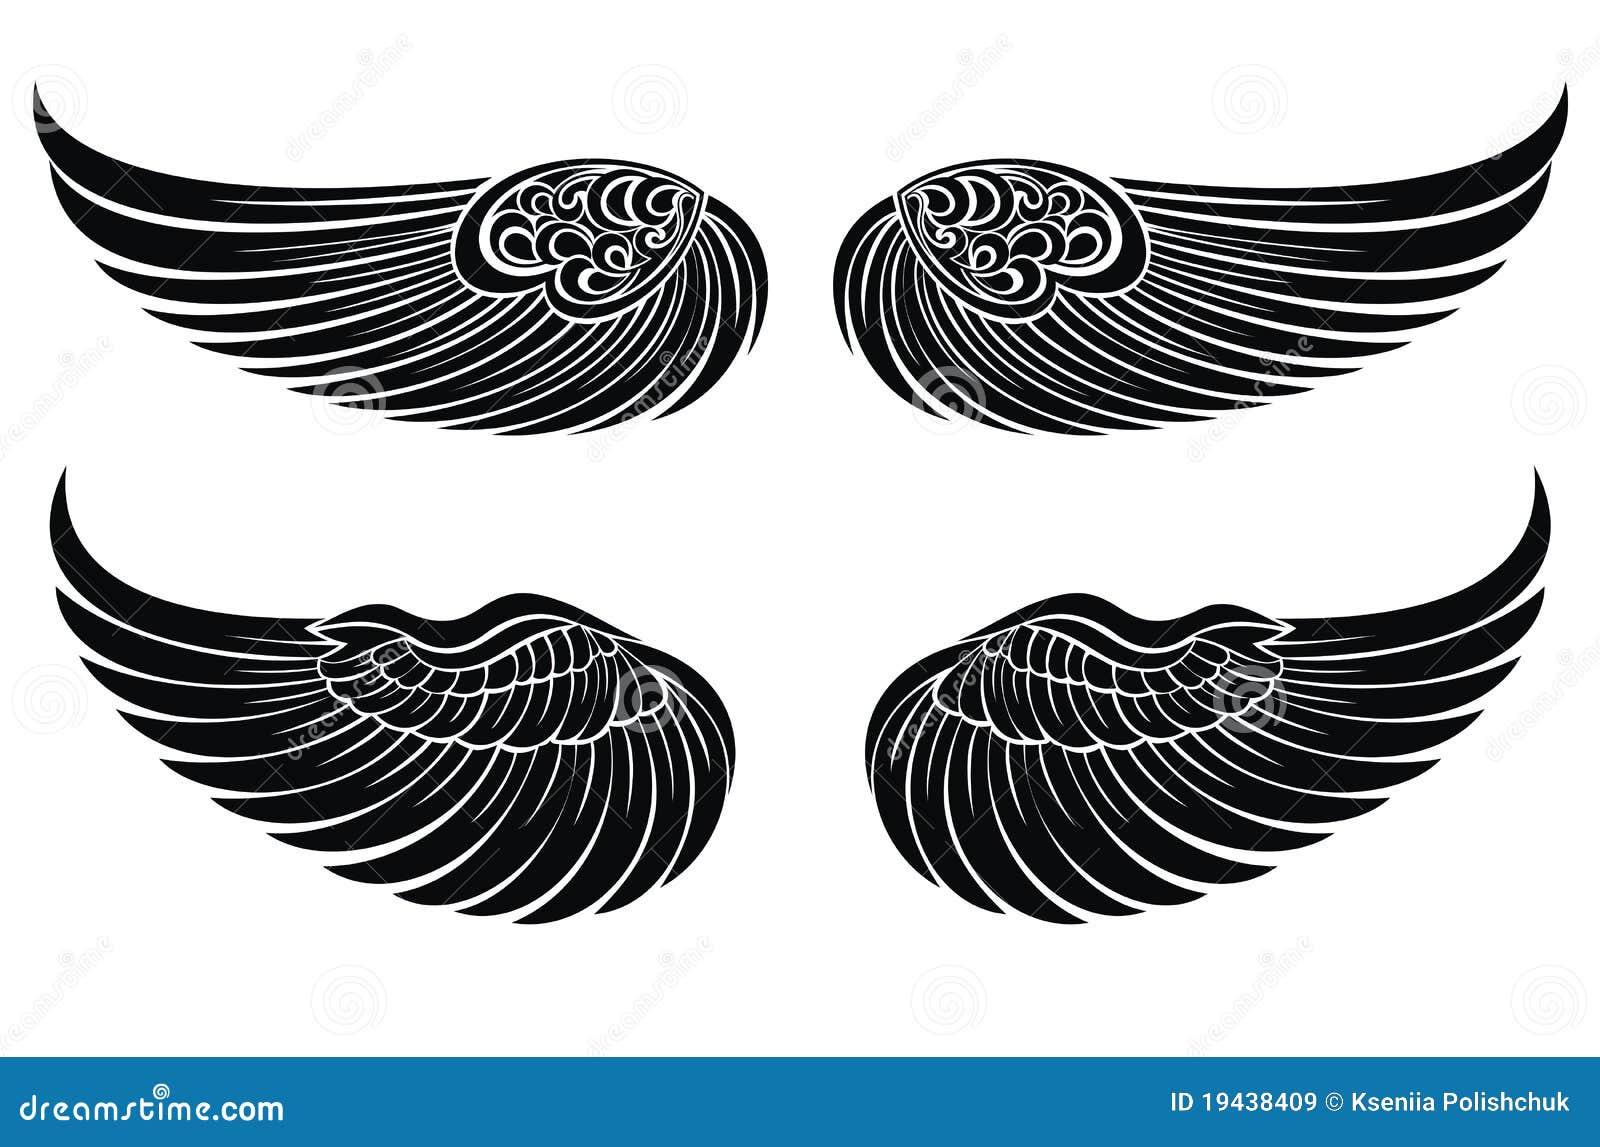 Wing tattoo design - Angel Design Element Symbol Tattoo Wing